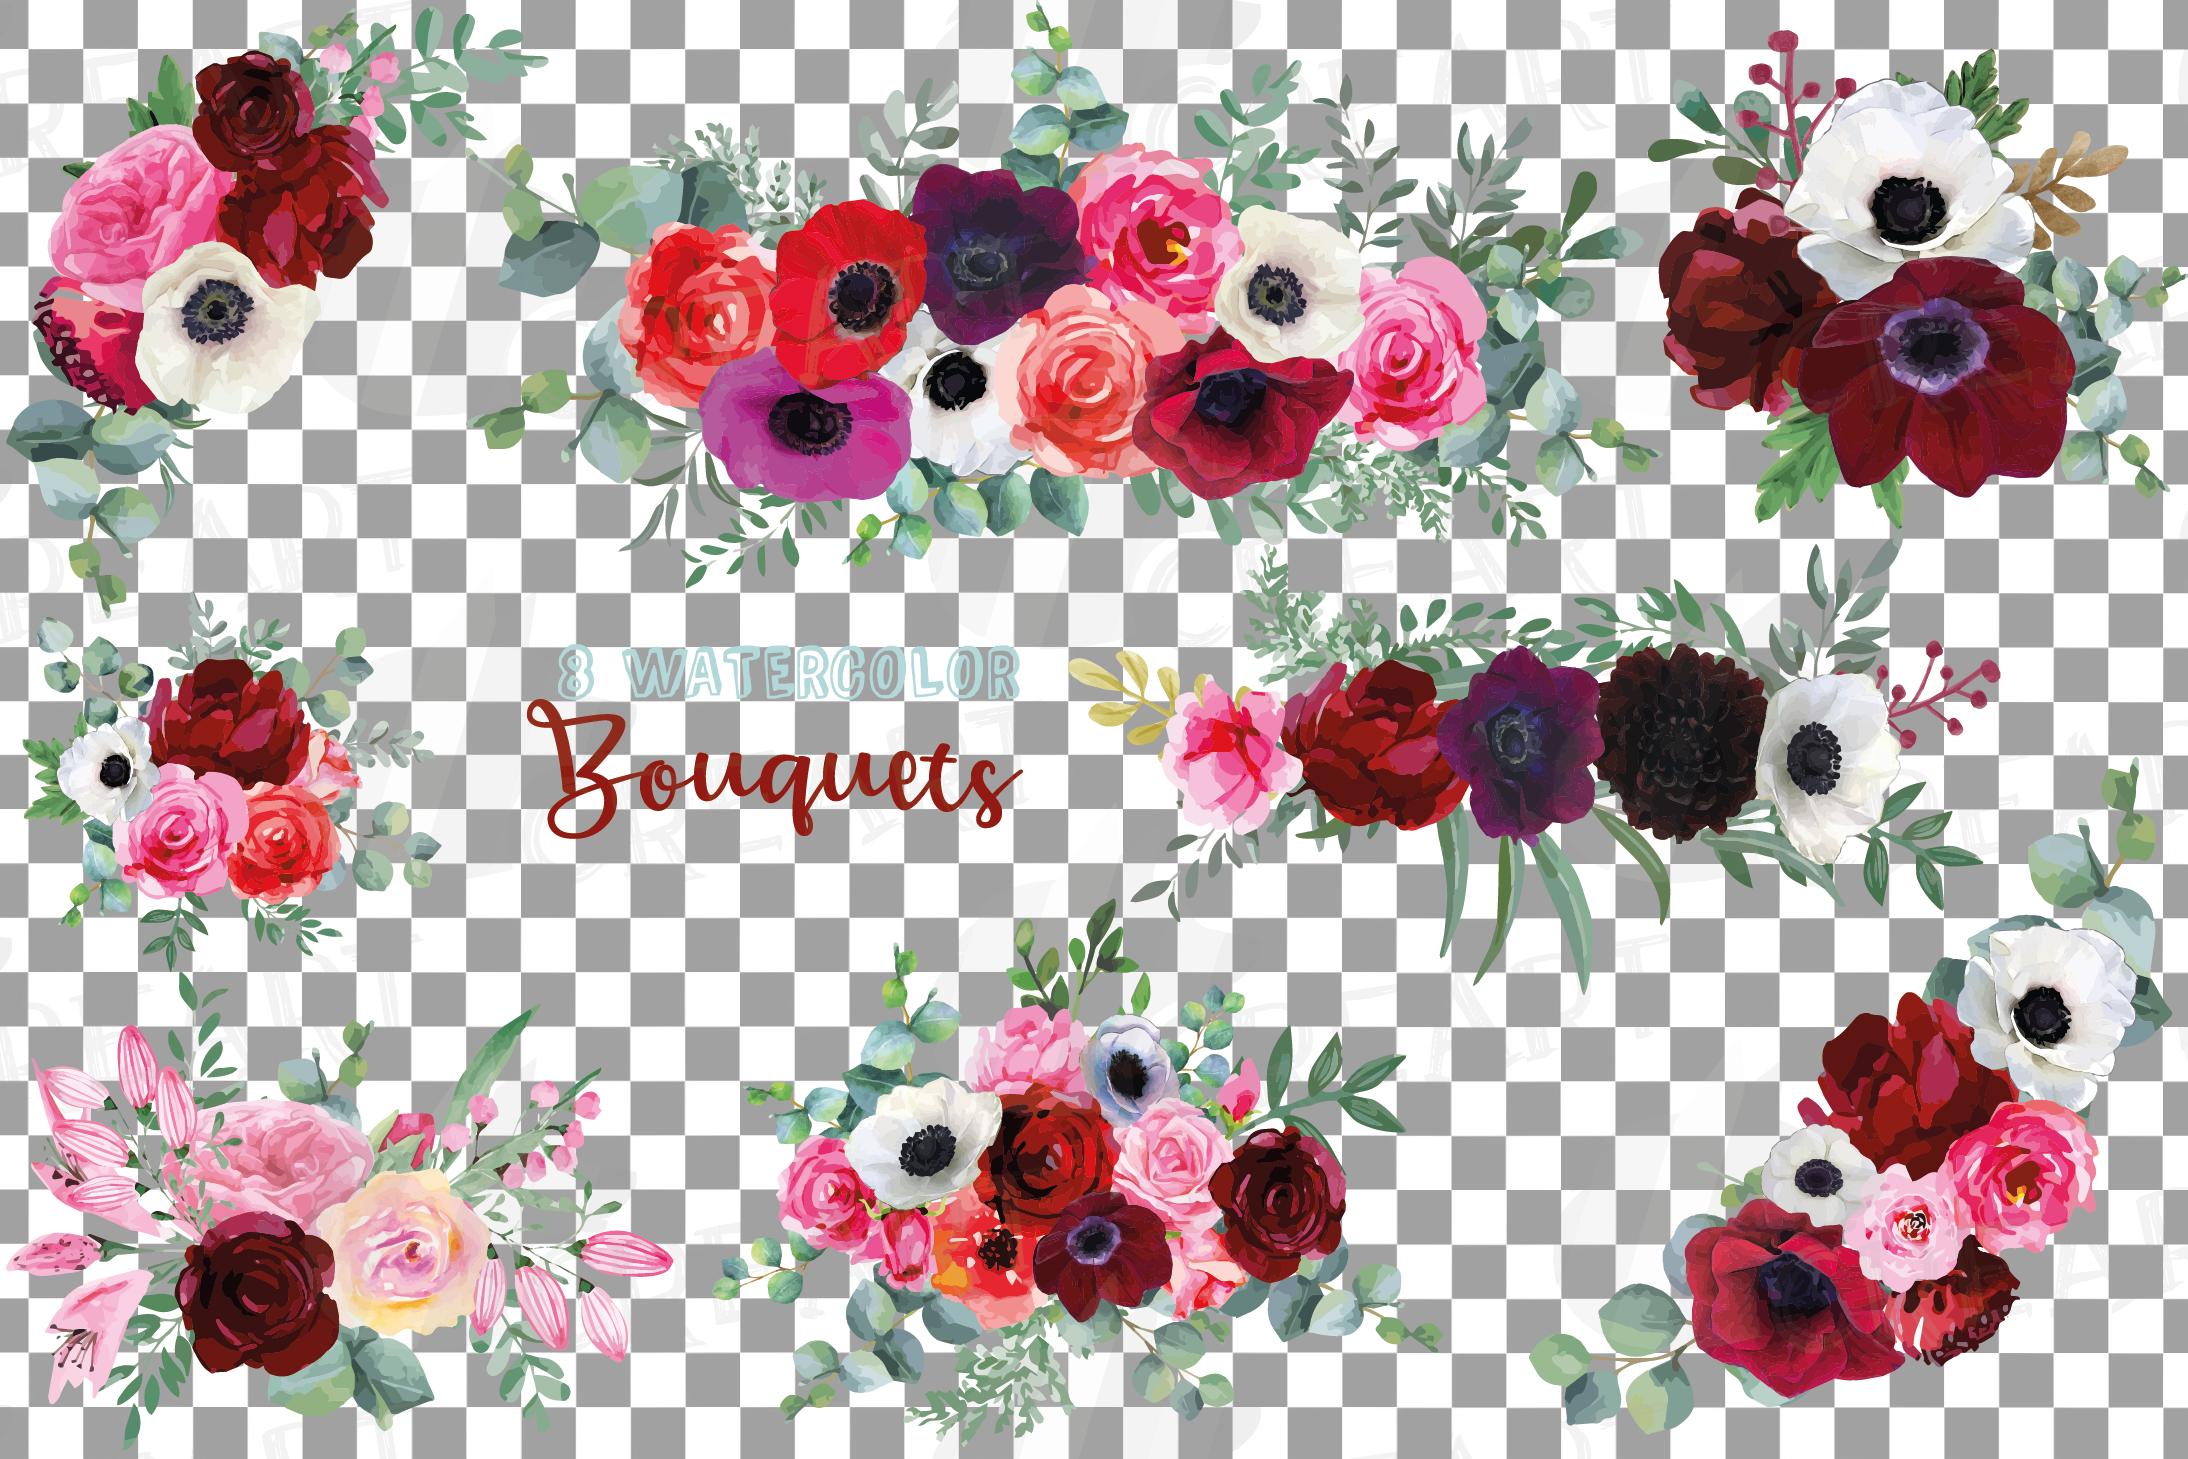 Watercolor elegant floral bouquets, rose, anemone decoration example image 2